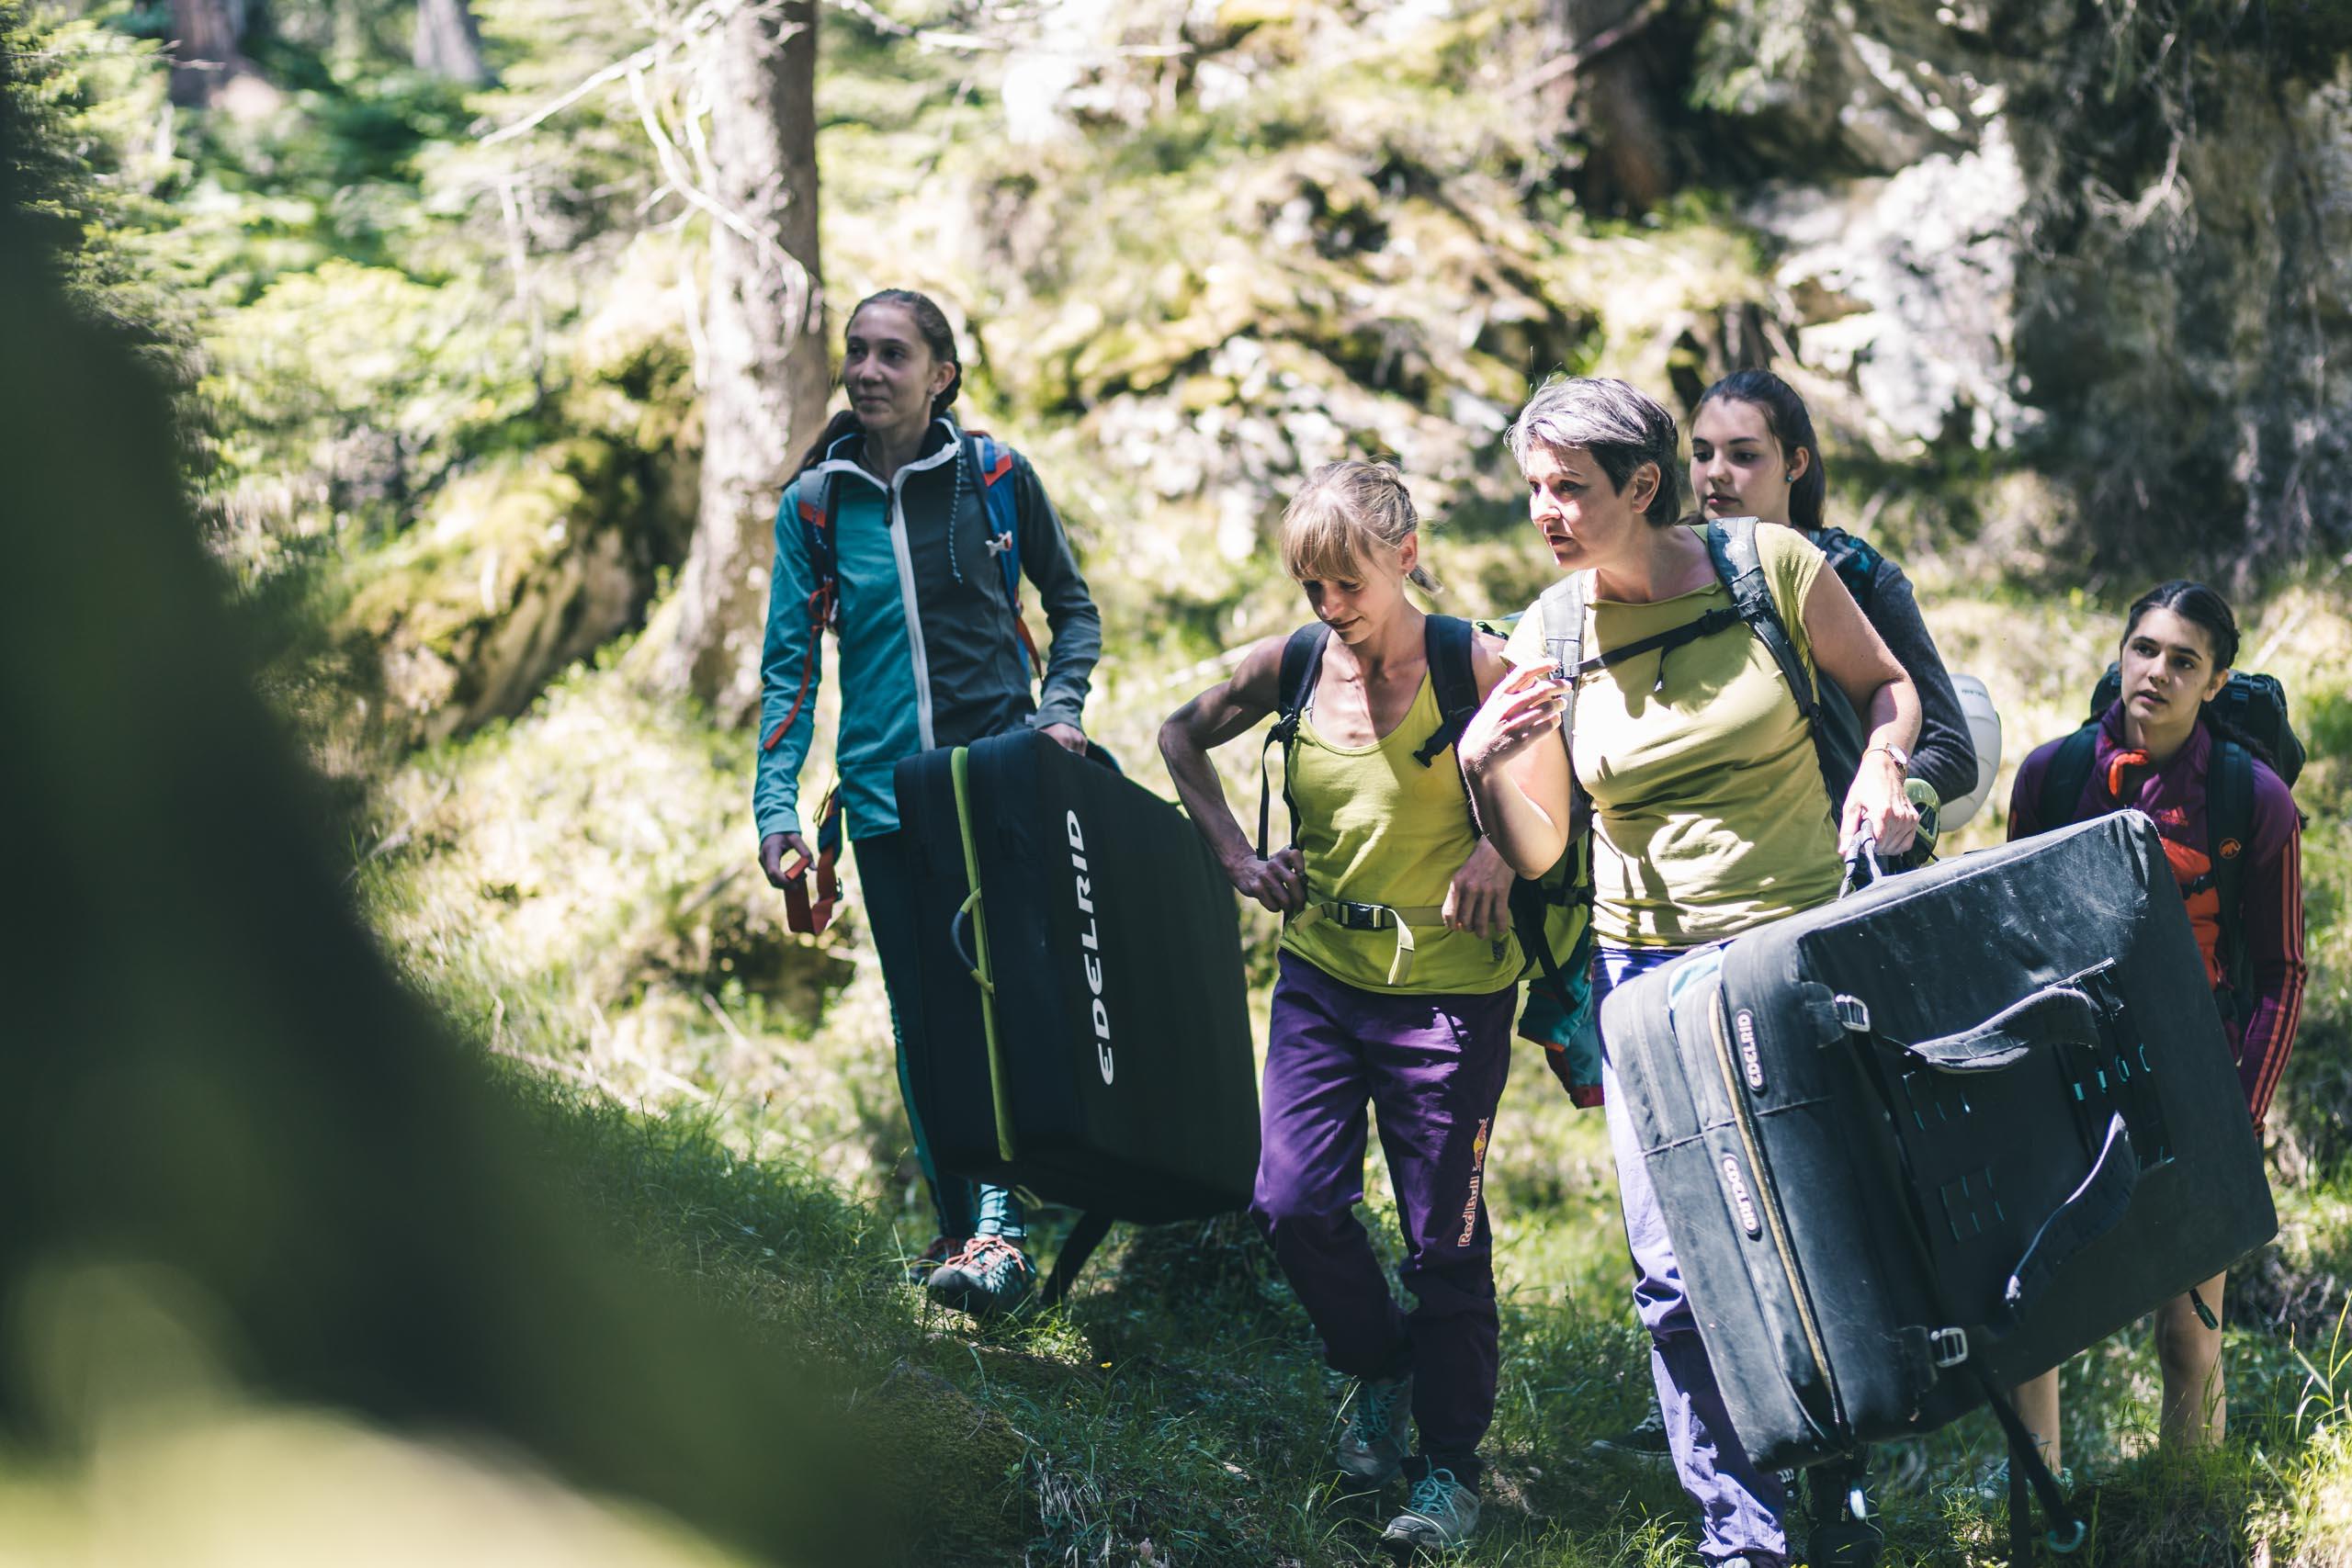 Bouldern Reithle, Foto: Imst Tourismus-West I Climbers Paradise